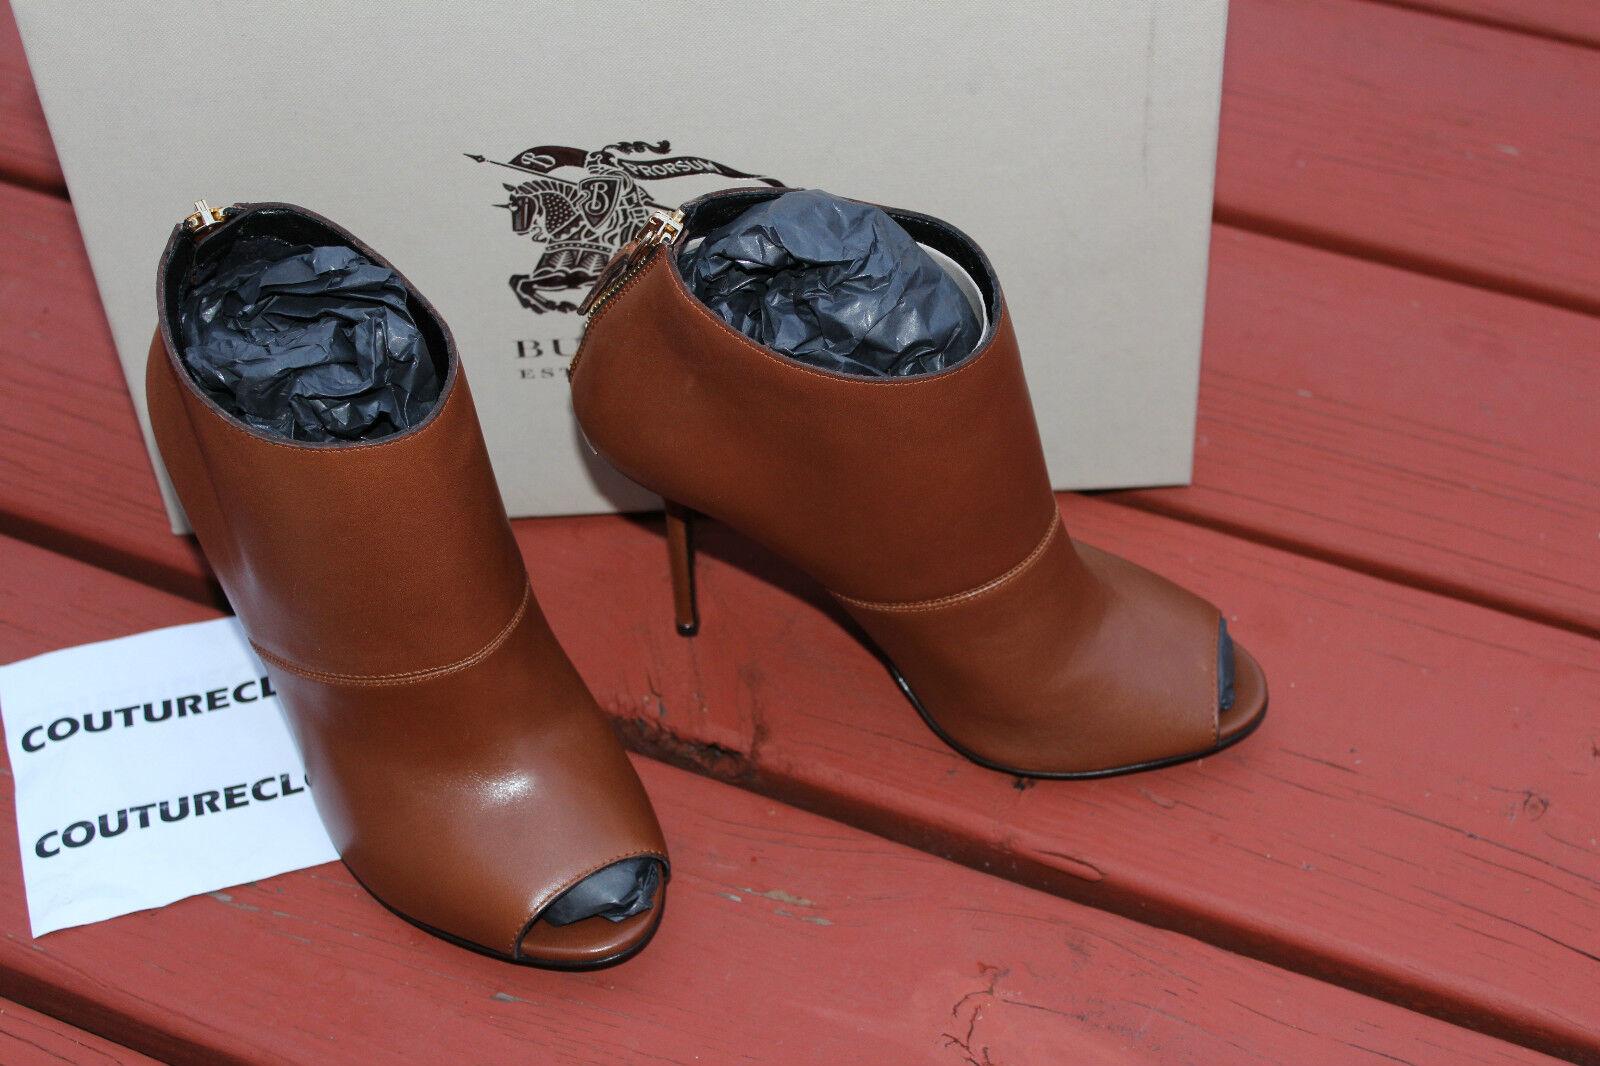 BURBERRY CALLUM Stiefel Stiefel Stiefel CHESTNUT braun  7us  750 8a623c